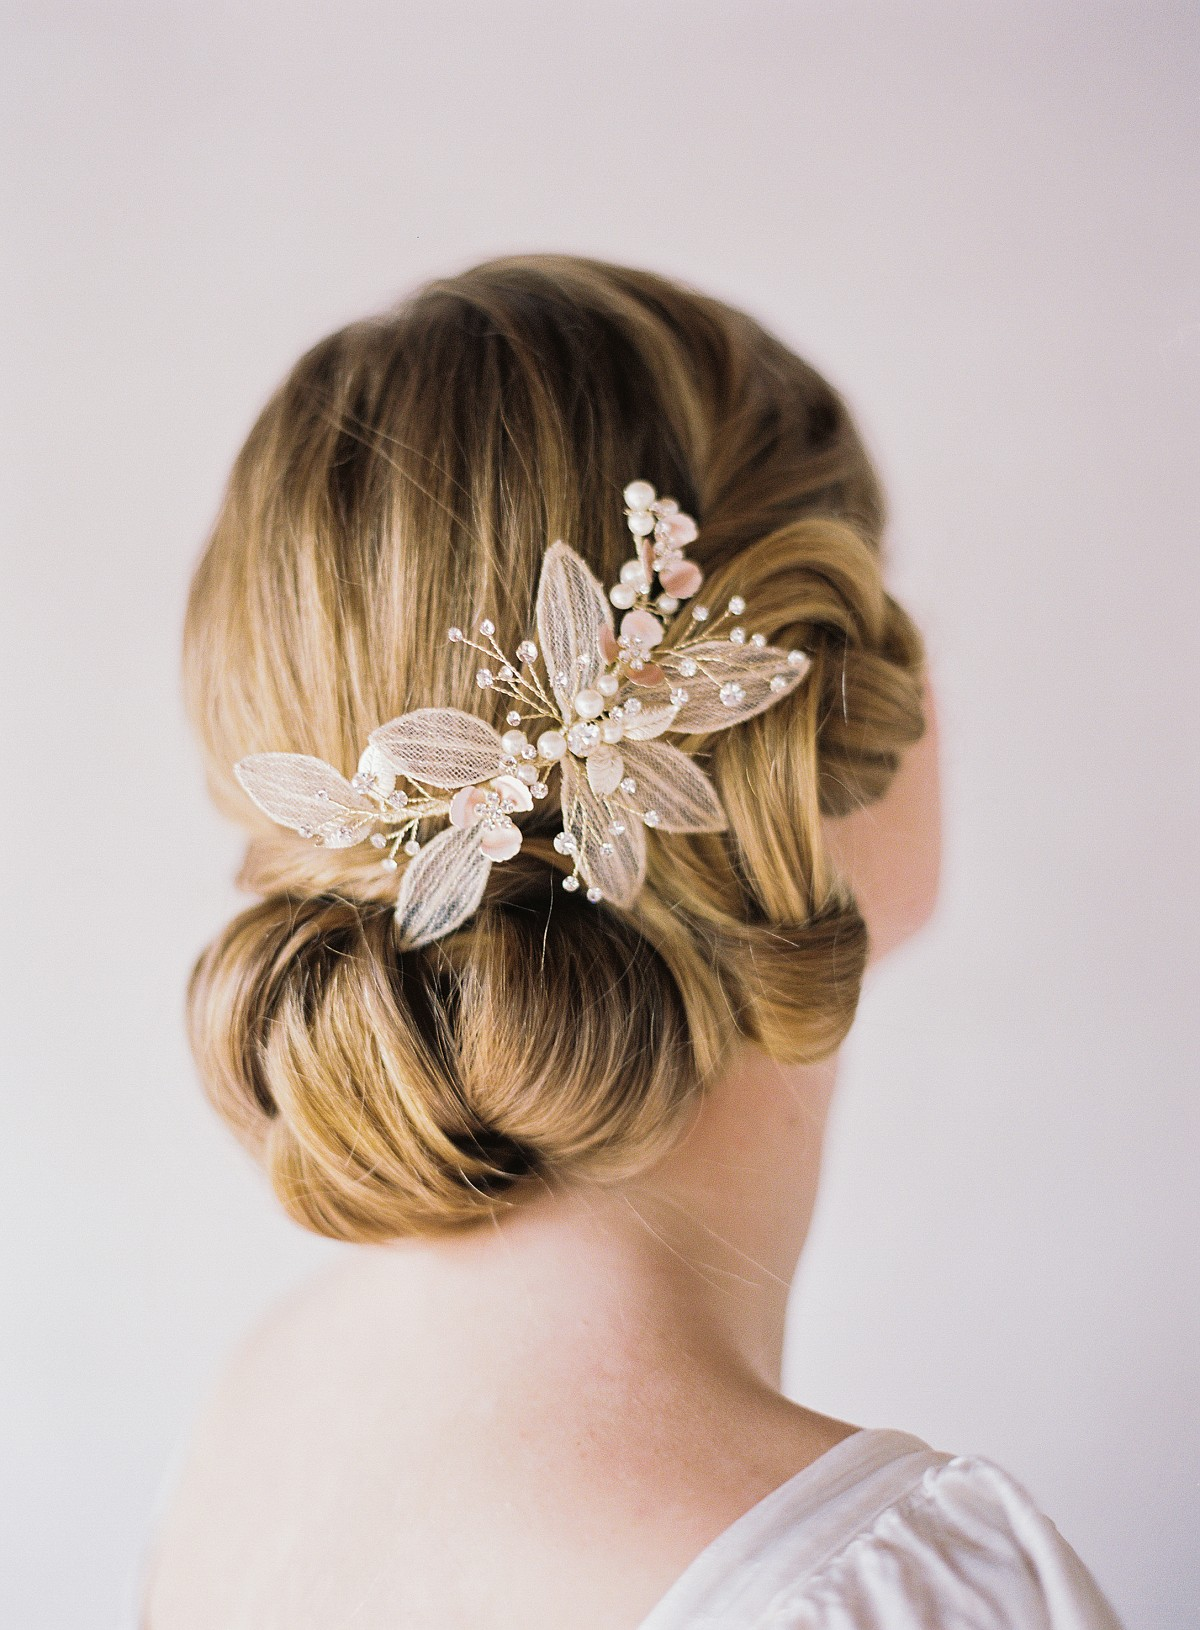 Bridal Hair & Make Up Ideas for the Fine Art Bride